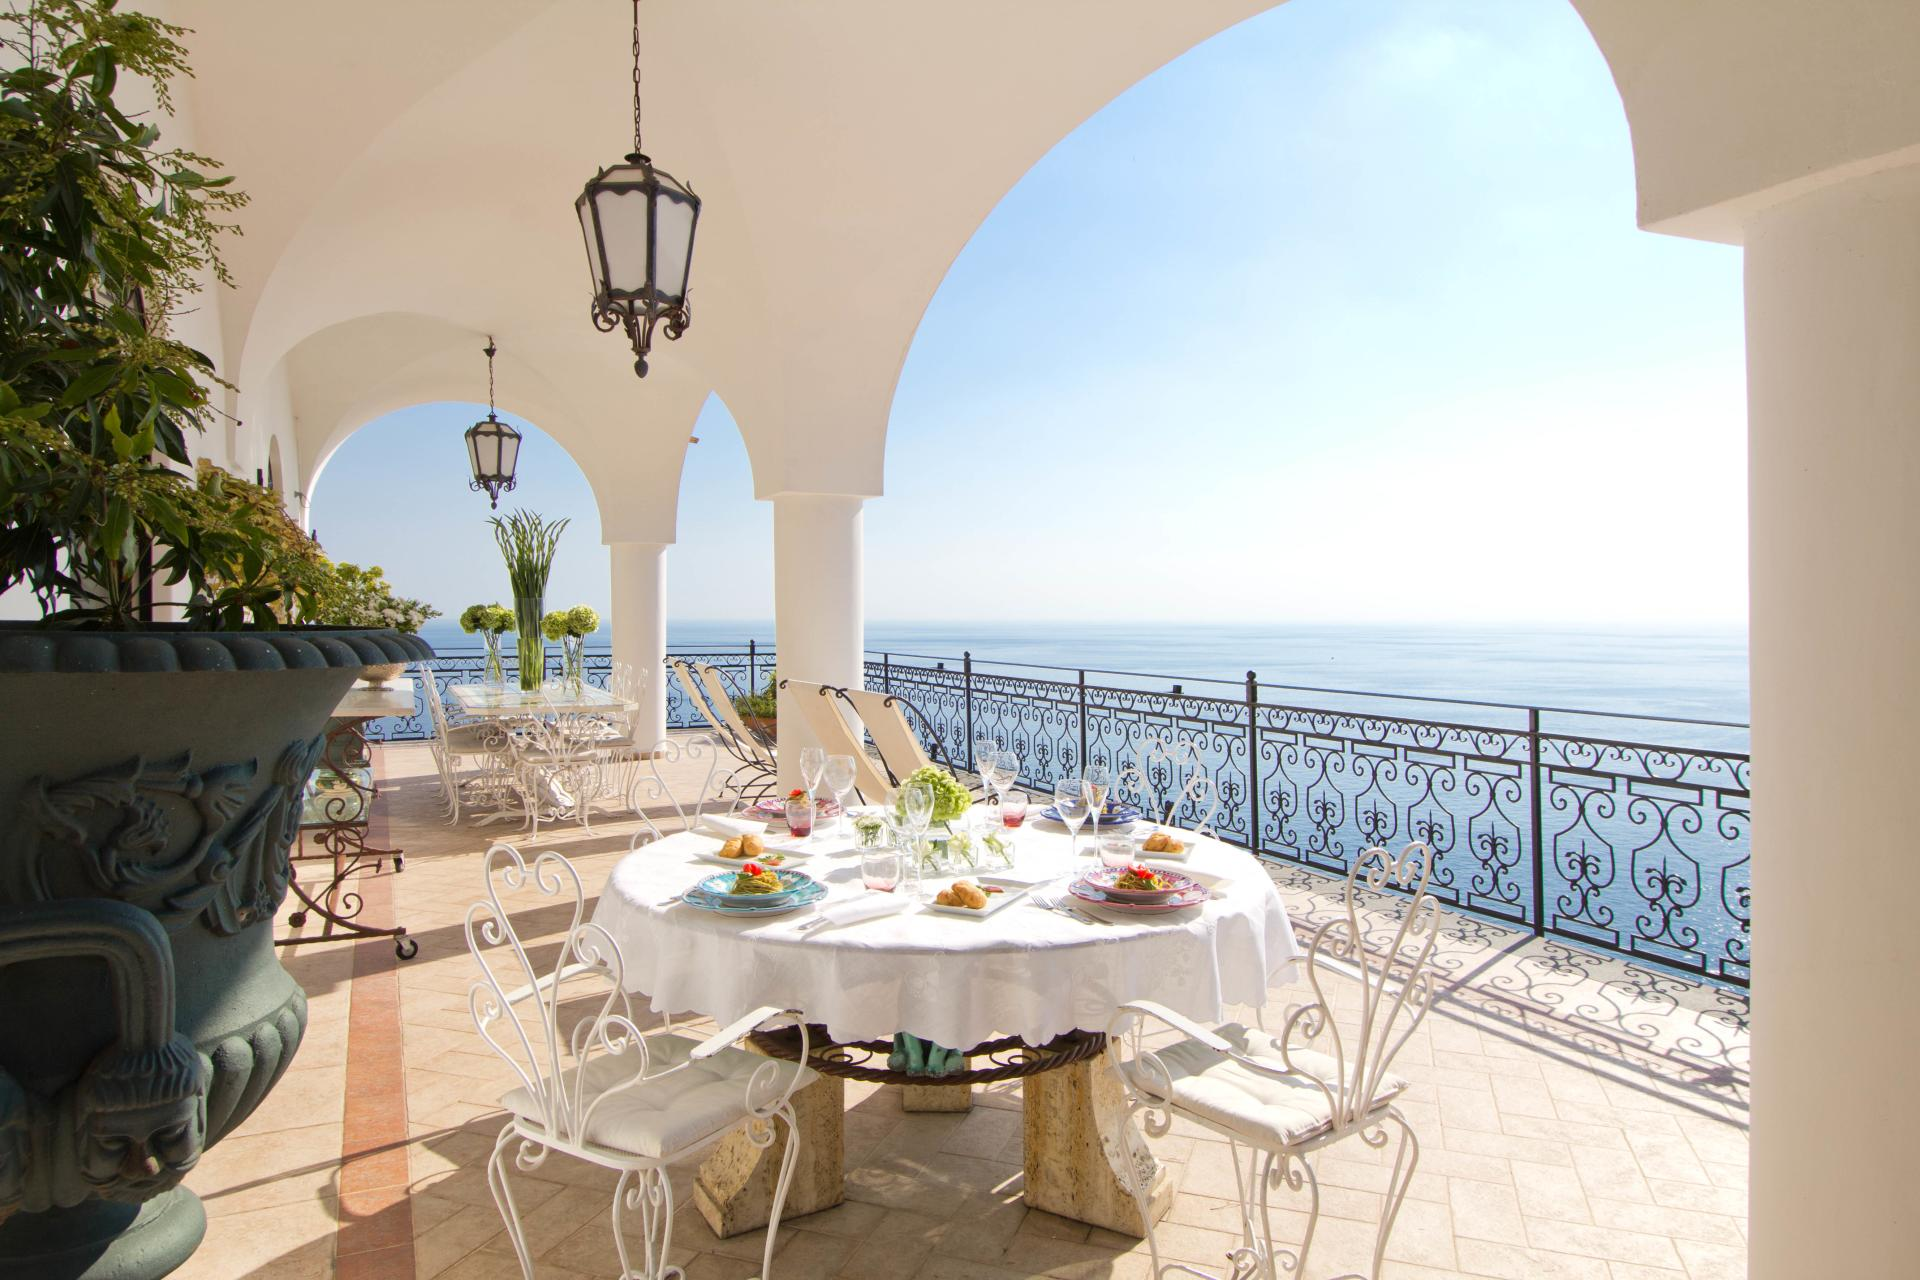 Outdoor Dining Area and View , La Scogliera, Positano, Amalfi Coast Campania.